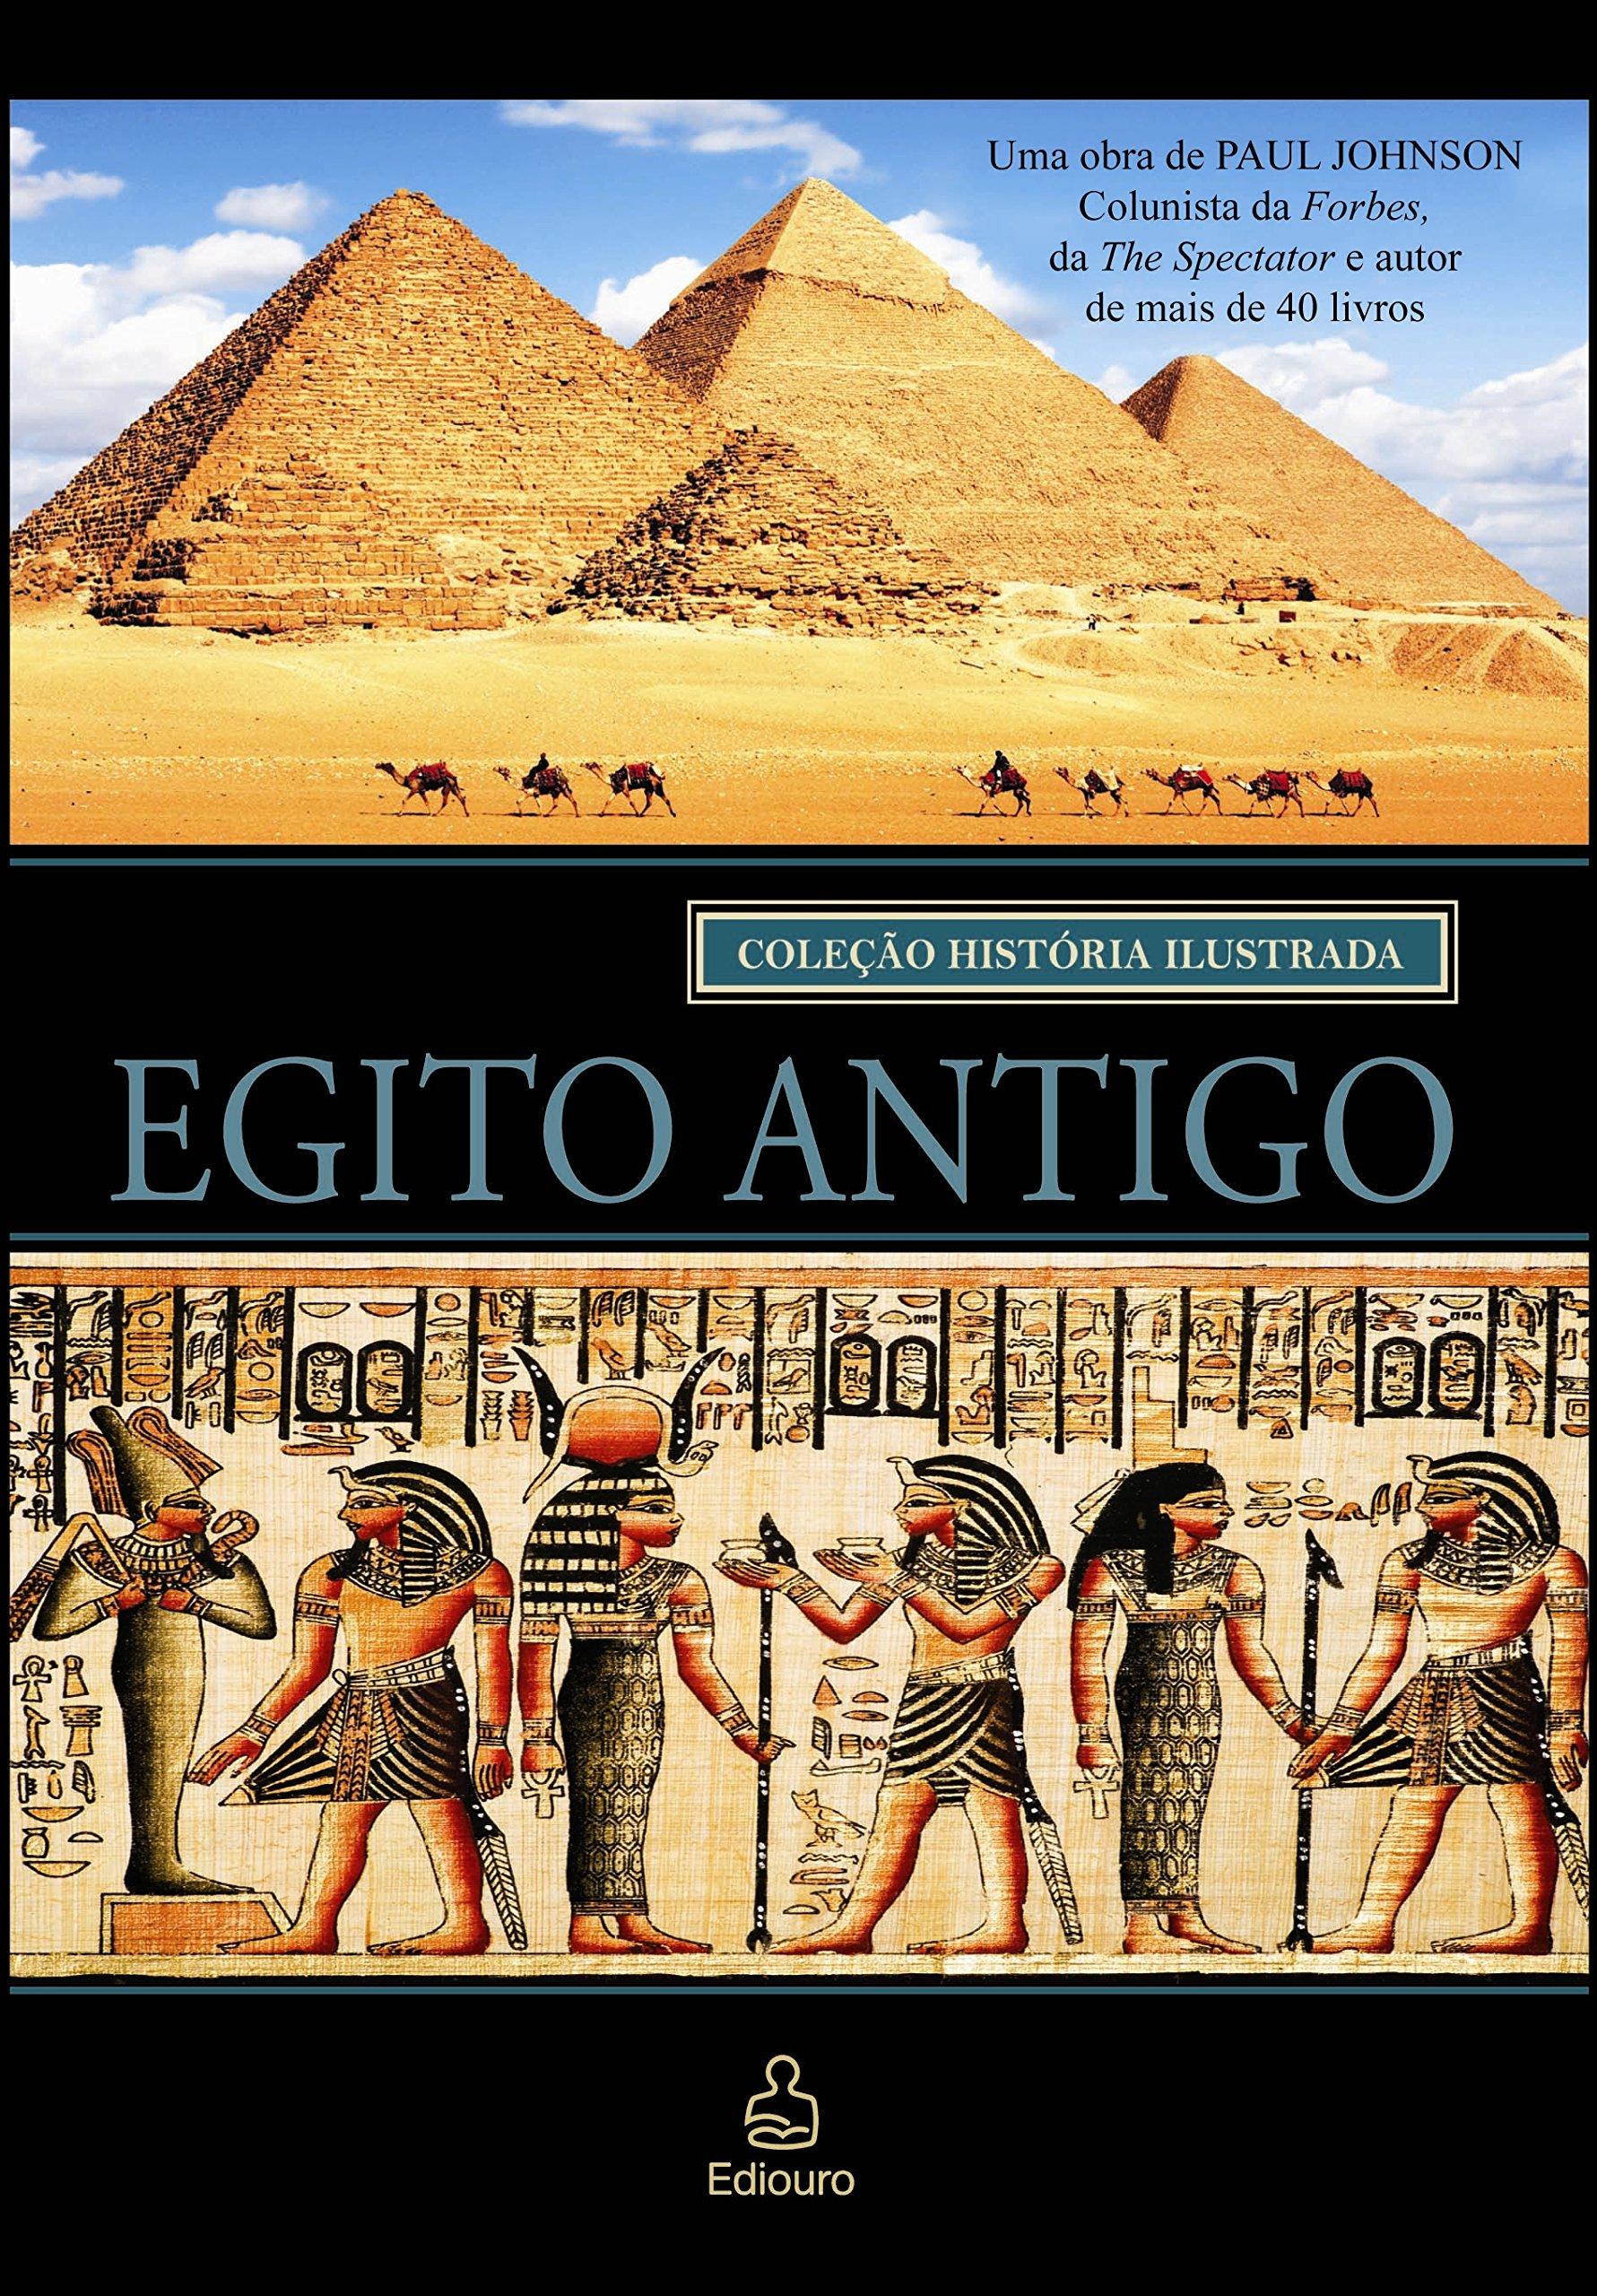 Historia ilustrada do egito antigo pdf download